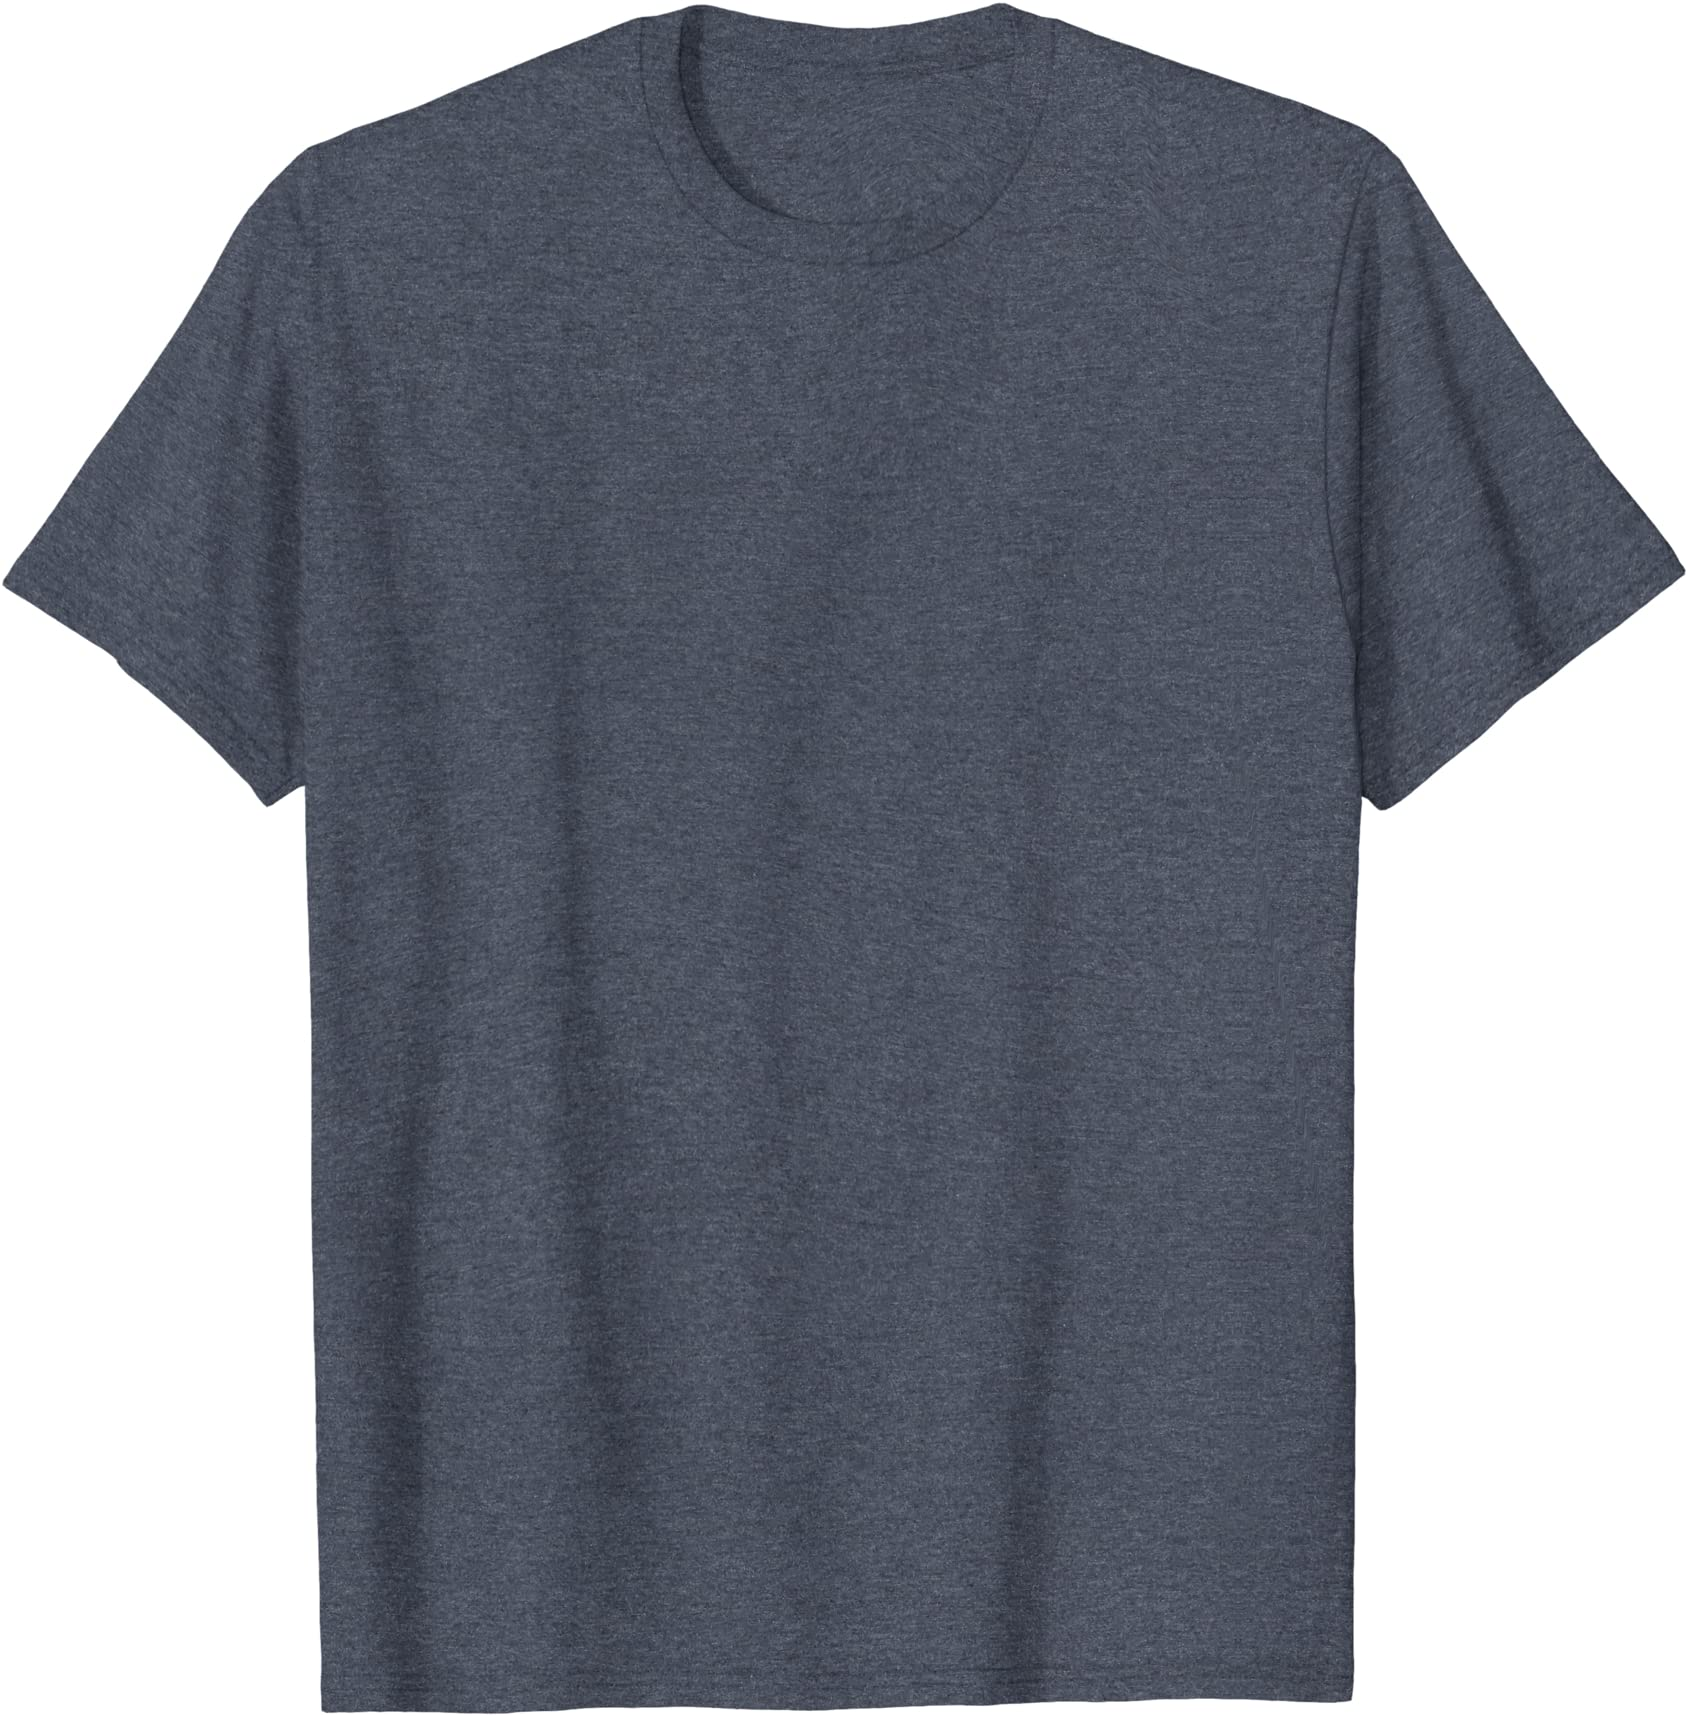 SCALE,TSHIRT Mens Beard Scale T-Shirt Funny FATHERS DAY GRANDAD Joke Gift DAD